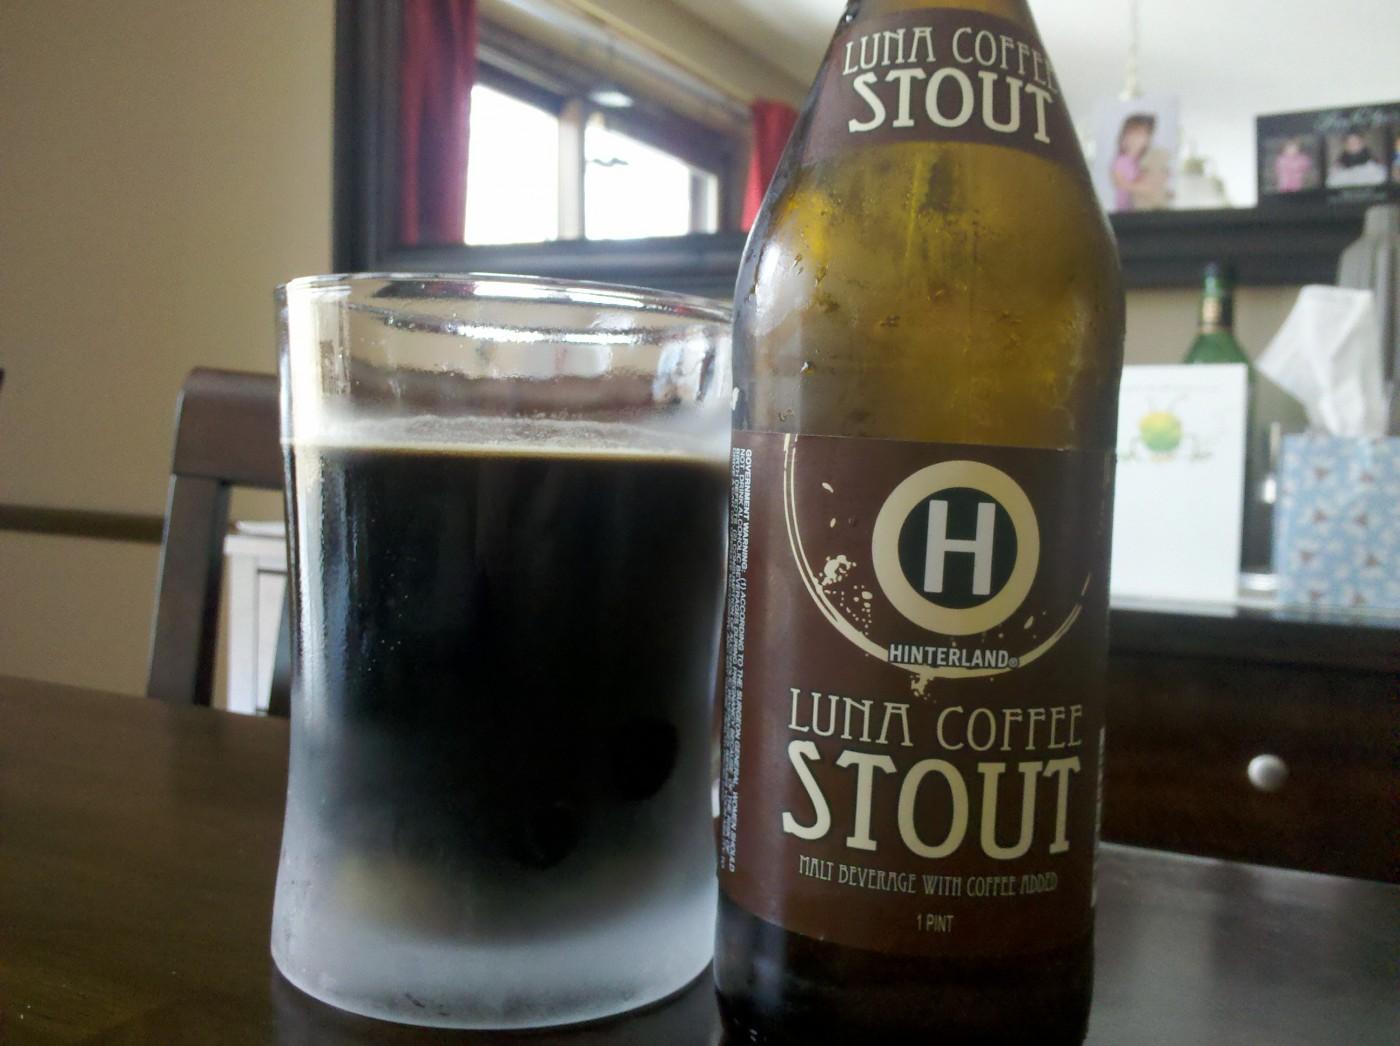 Hinterland Luna Coffee Stout